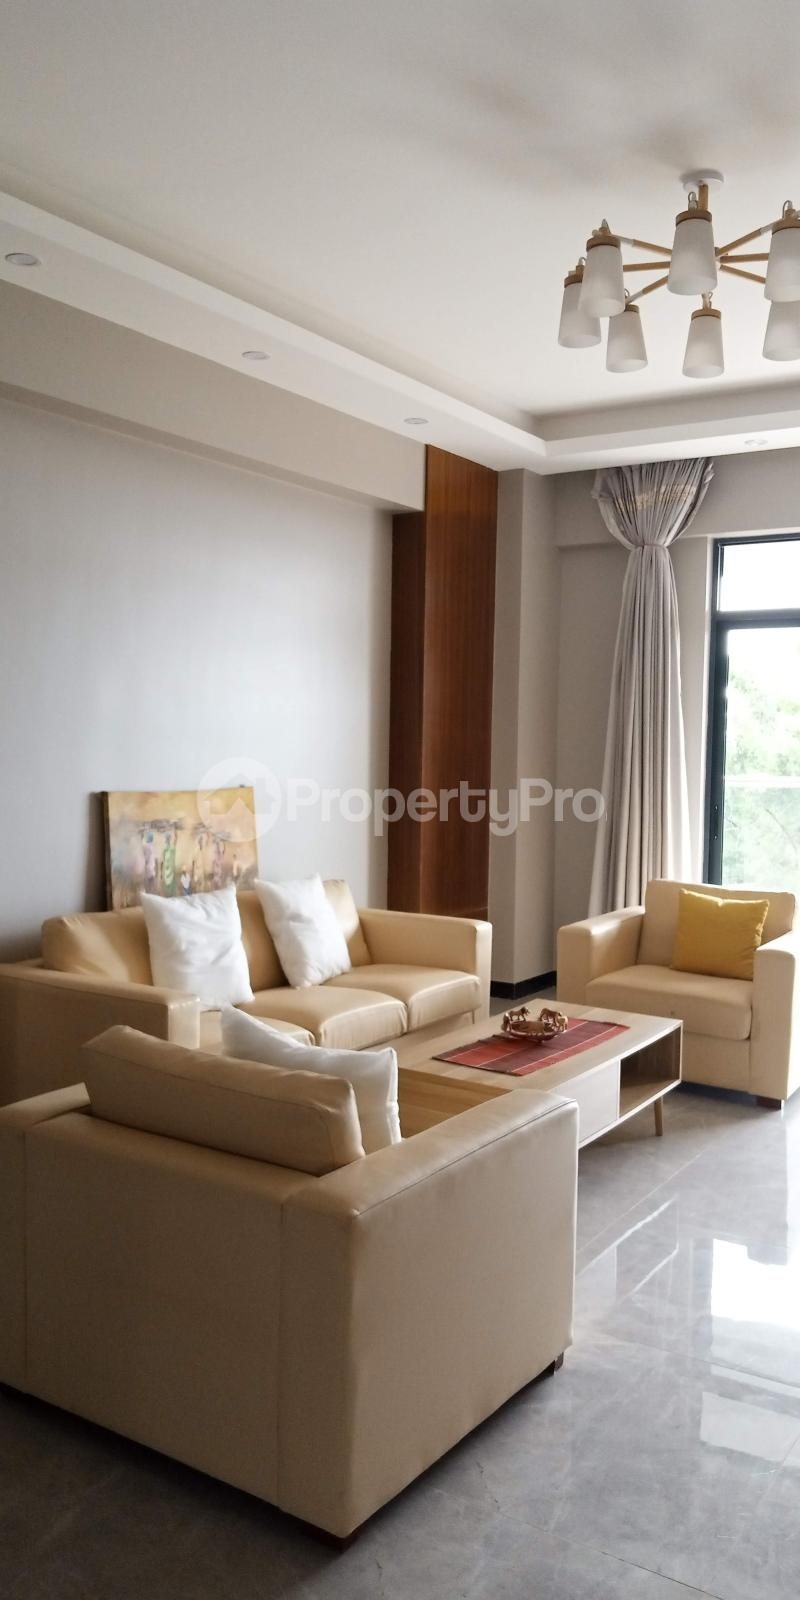 3 bedroom Apartment for rent Naguru Kampala Central Kampala Central - 5